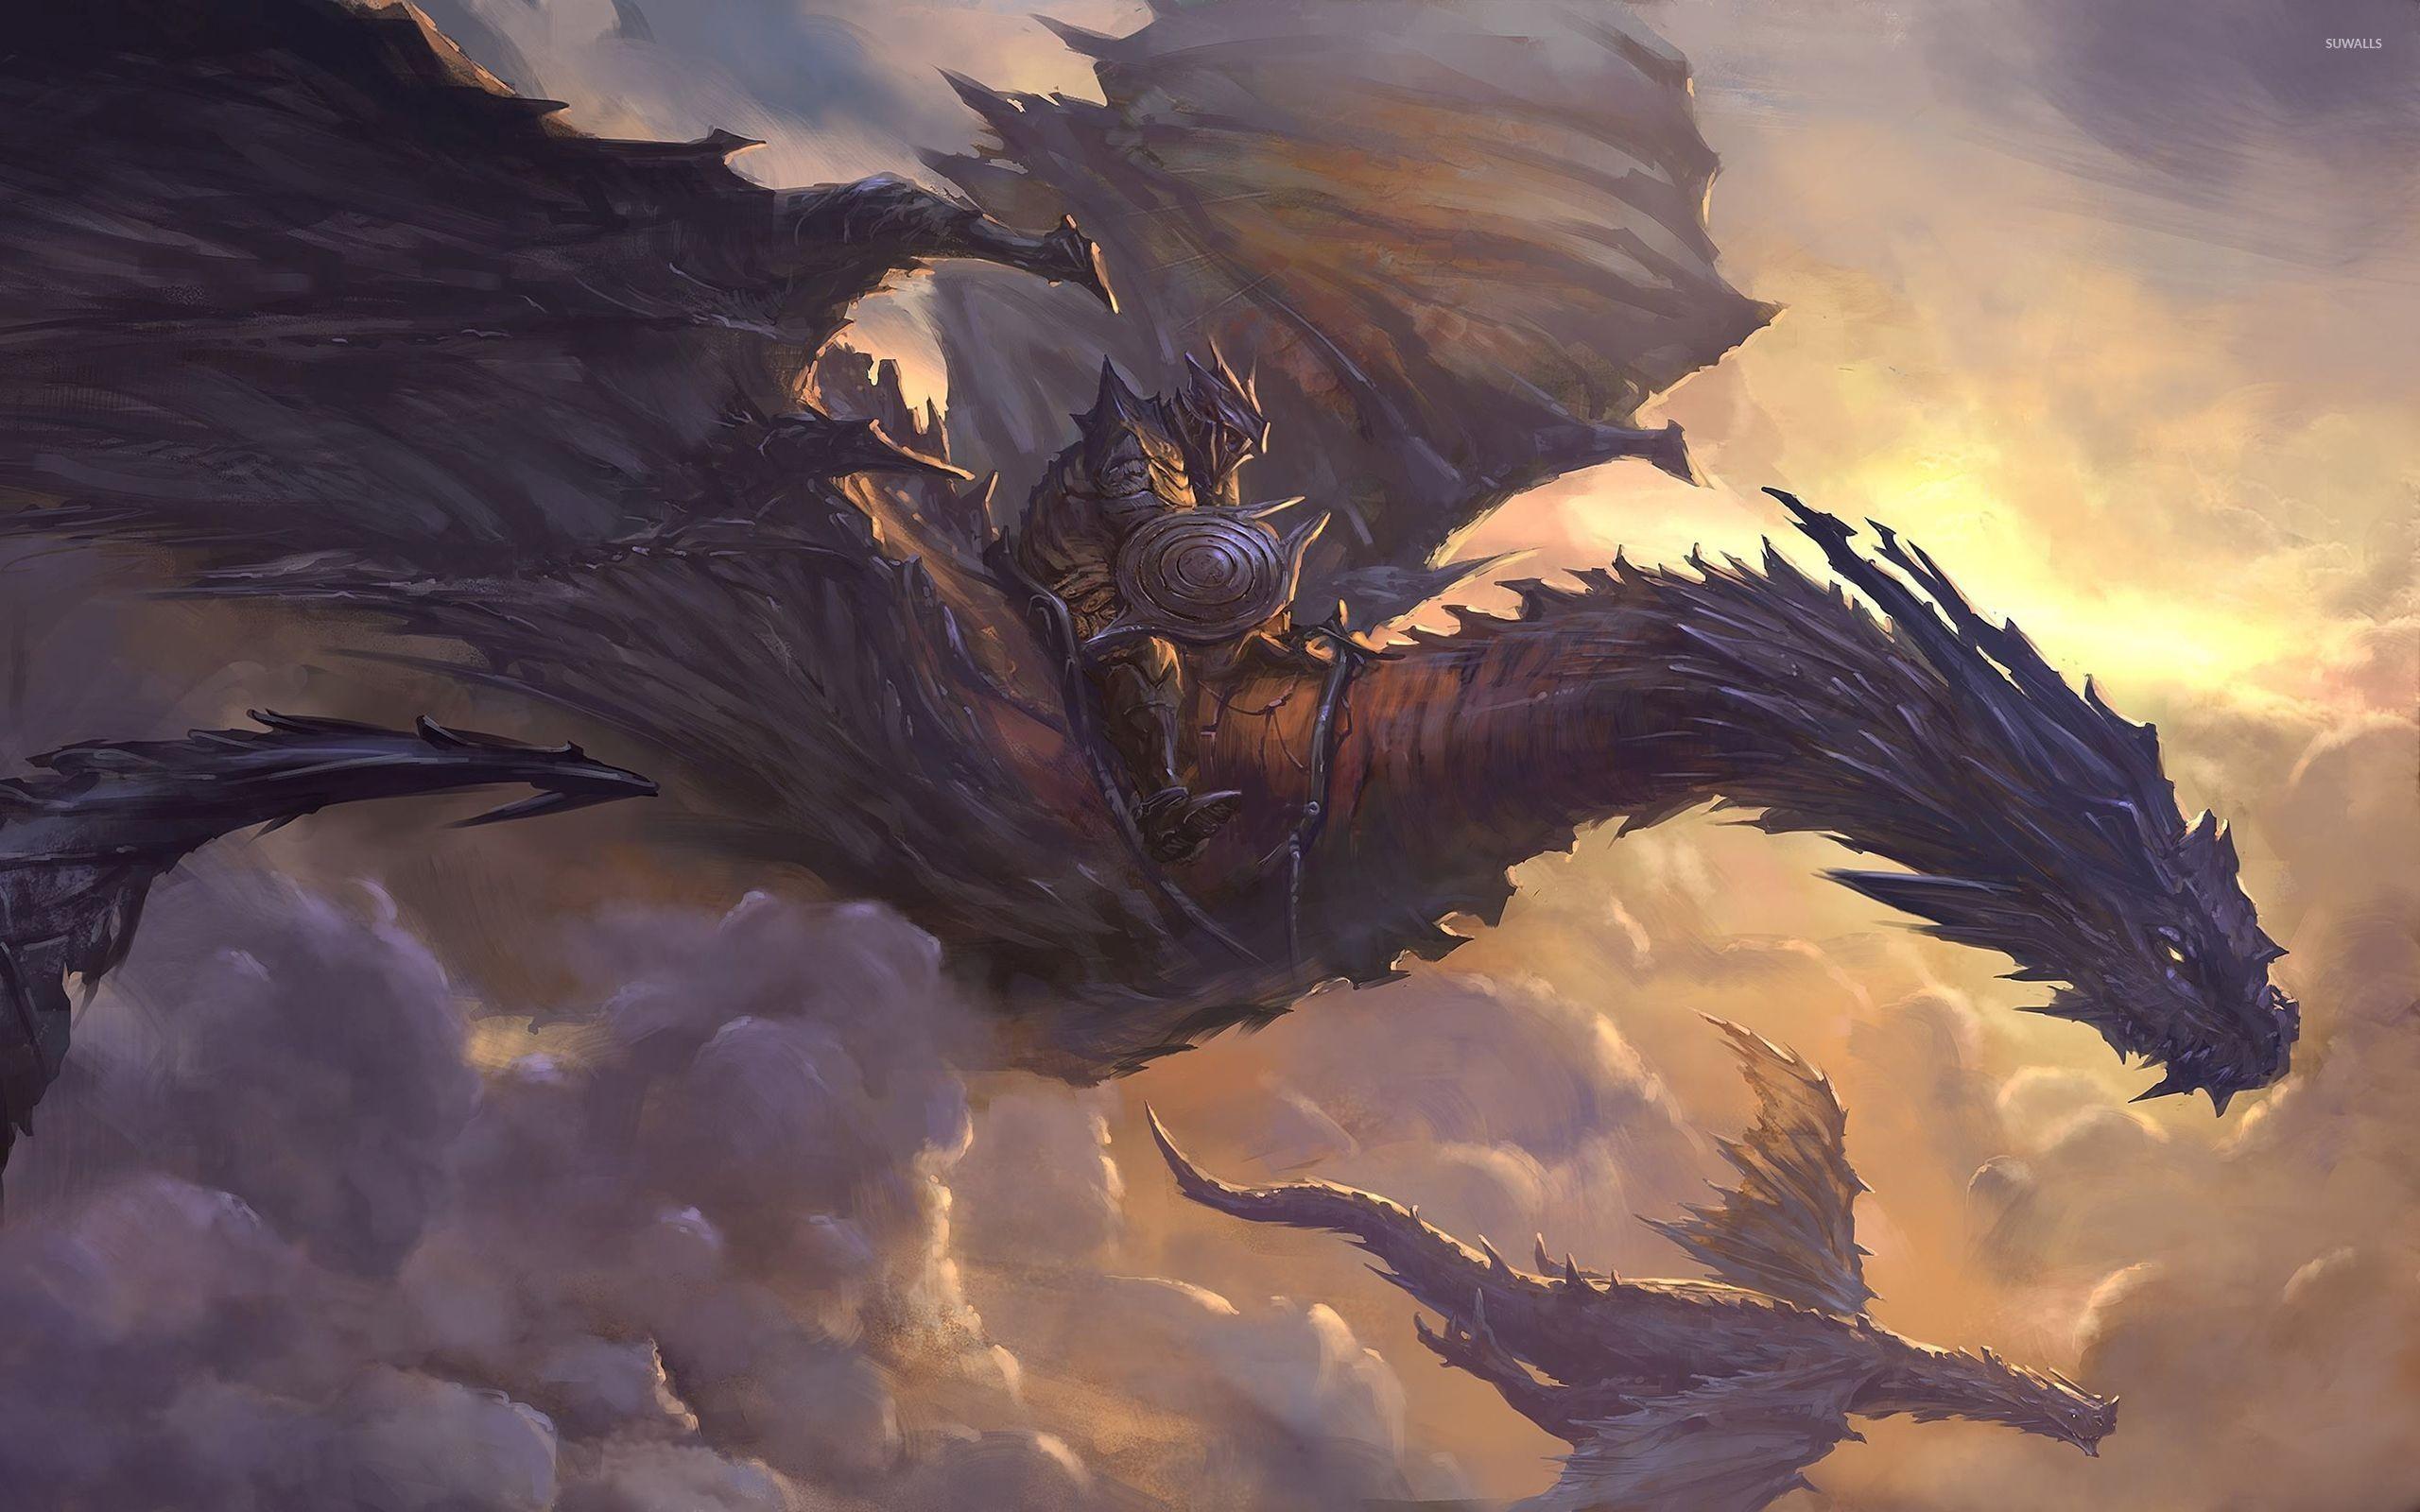 Wallpaperwiki Fantasy Dragon Dragons Backgrounds 2560 1600